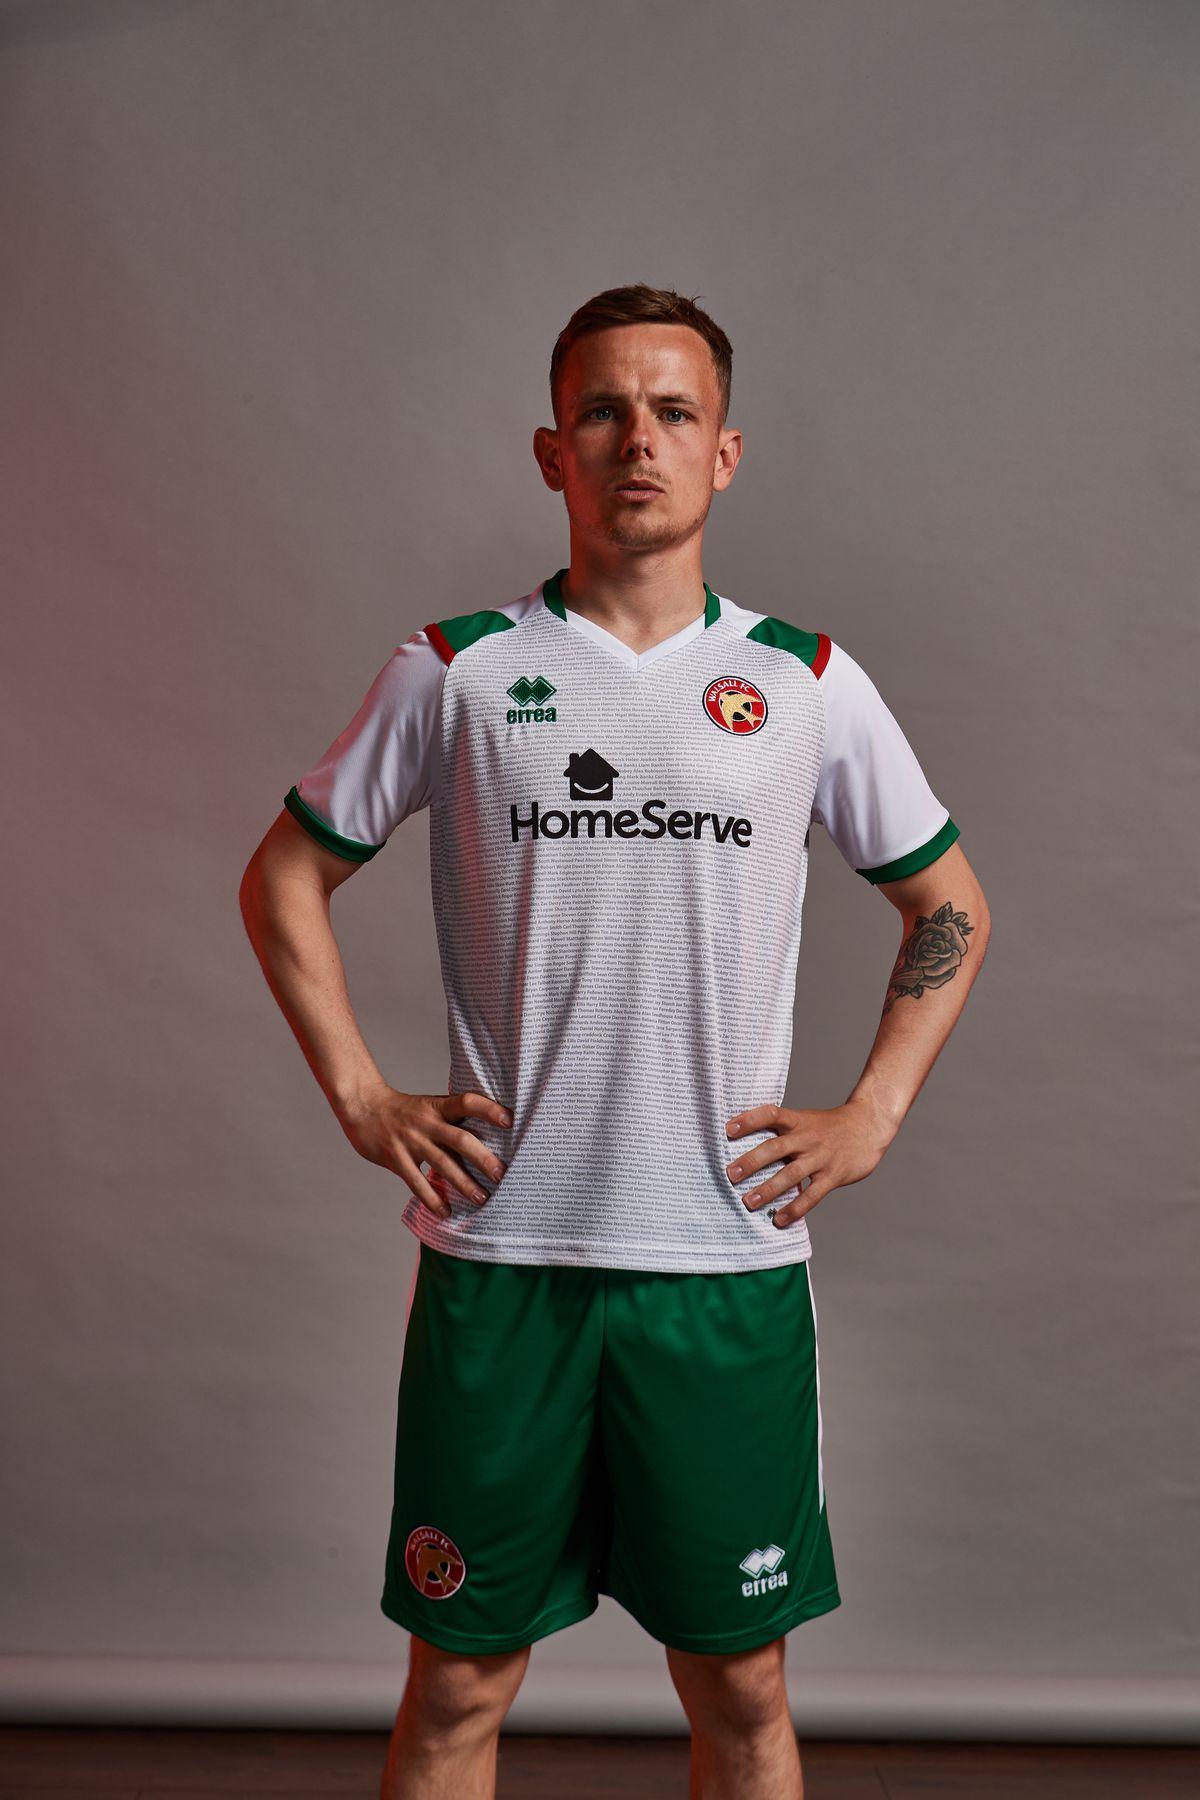 Liam Kinsella models the new third kit